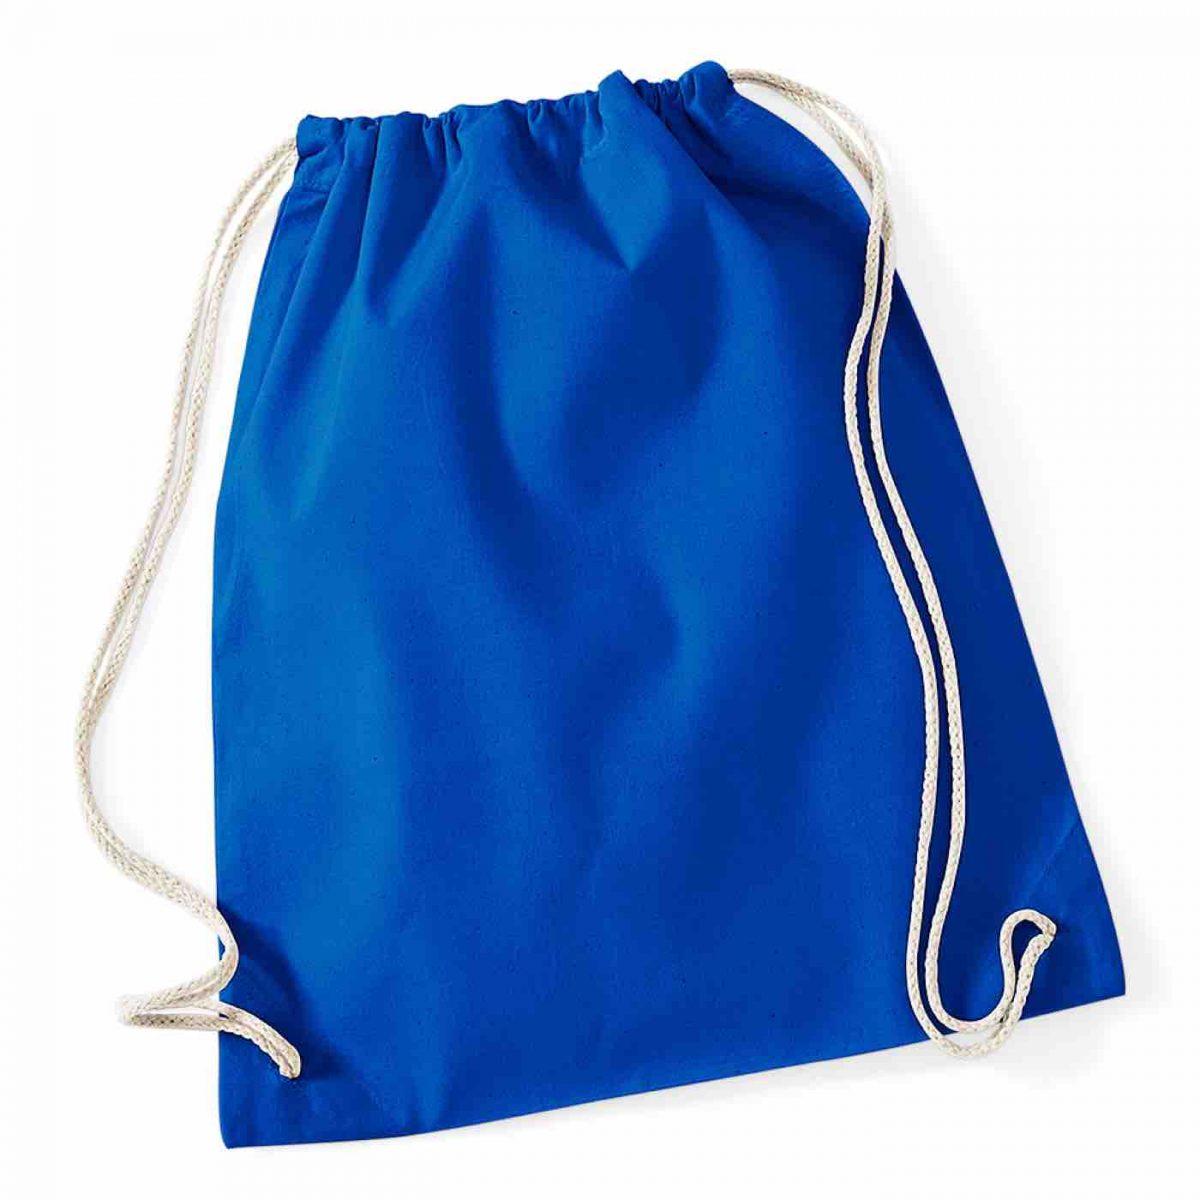 Bright Royal Cotton Tote Bag